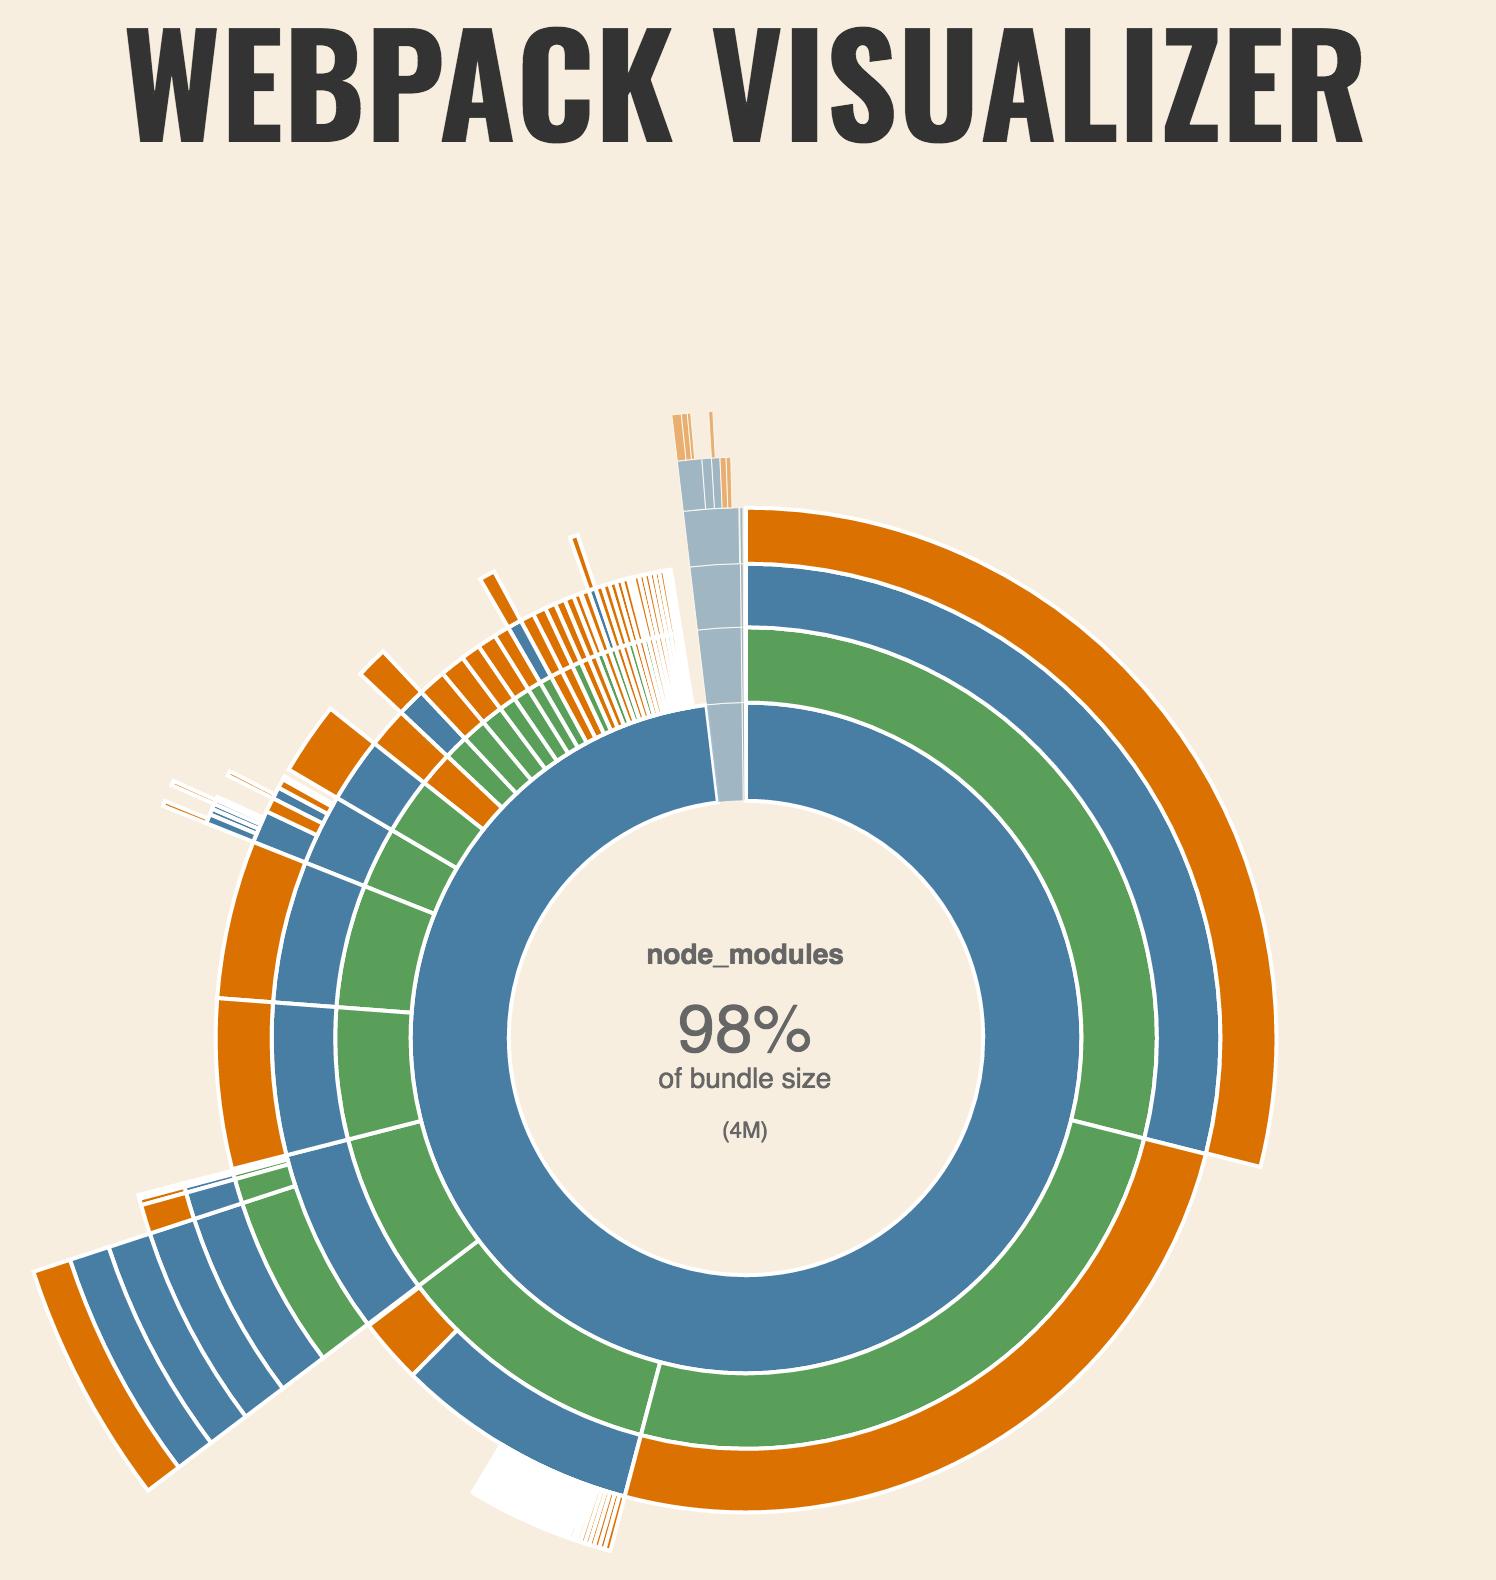 WEBPACK VISUALIZER